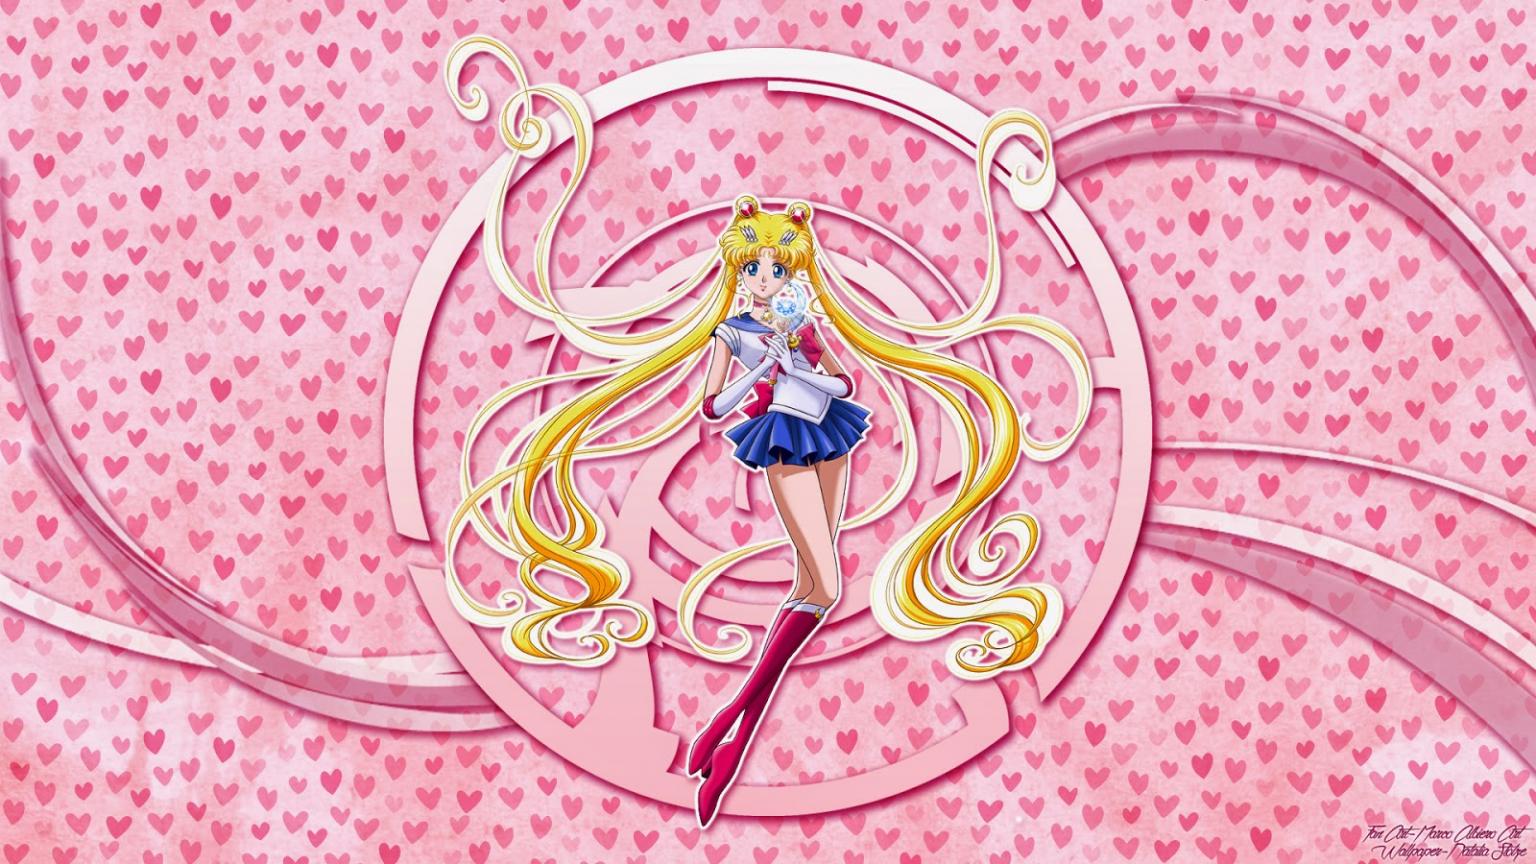 Free Download Unbreakable Sailor Moon Crystal Wallpaper Full Hd